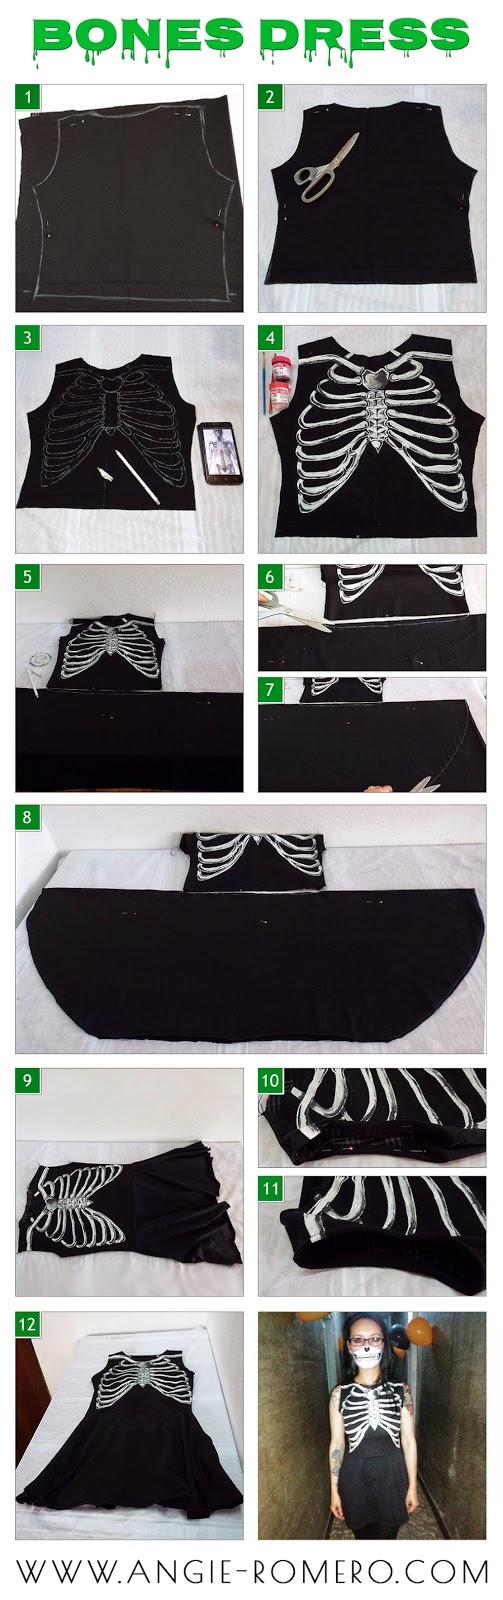 Vestido estampado esqueleto - Huesos humanos